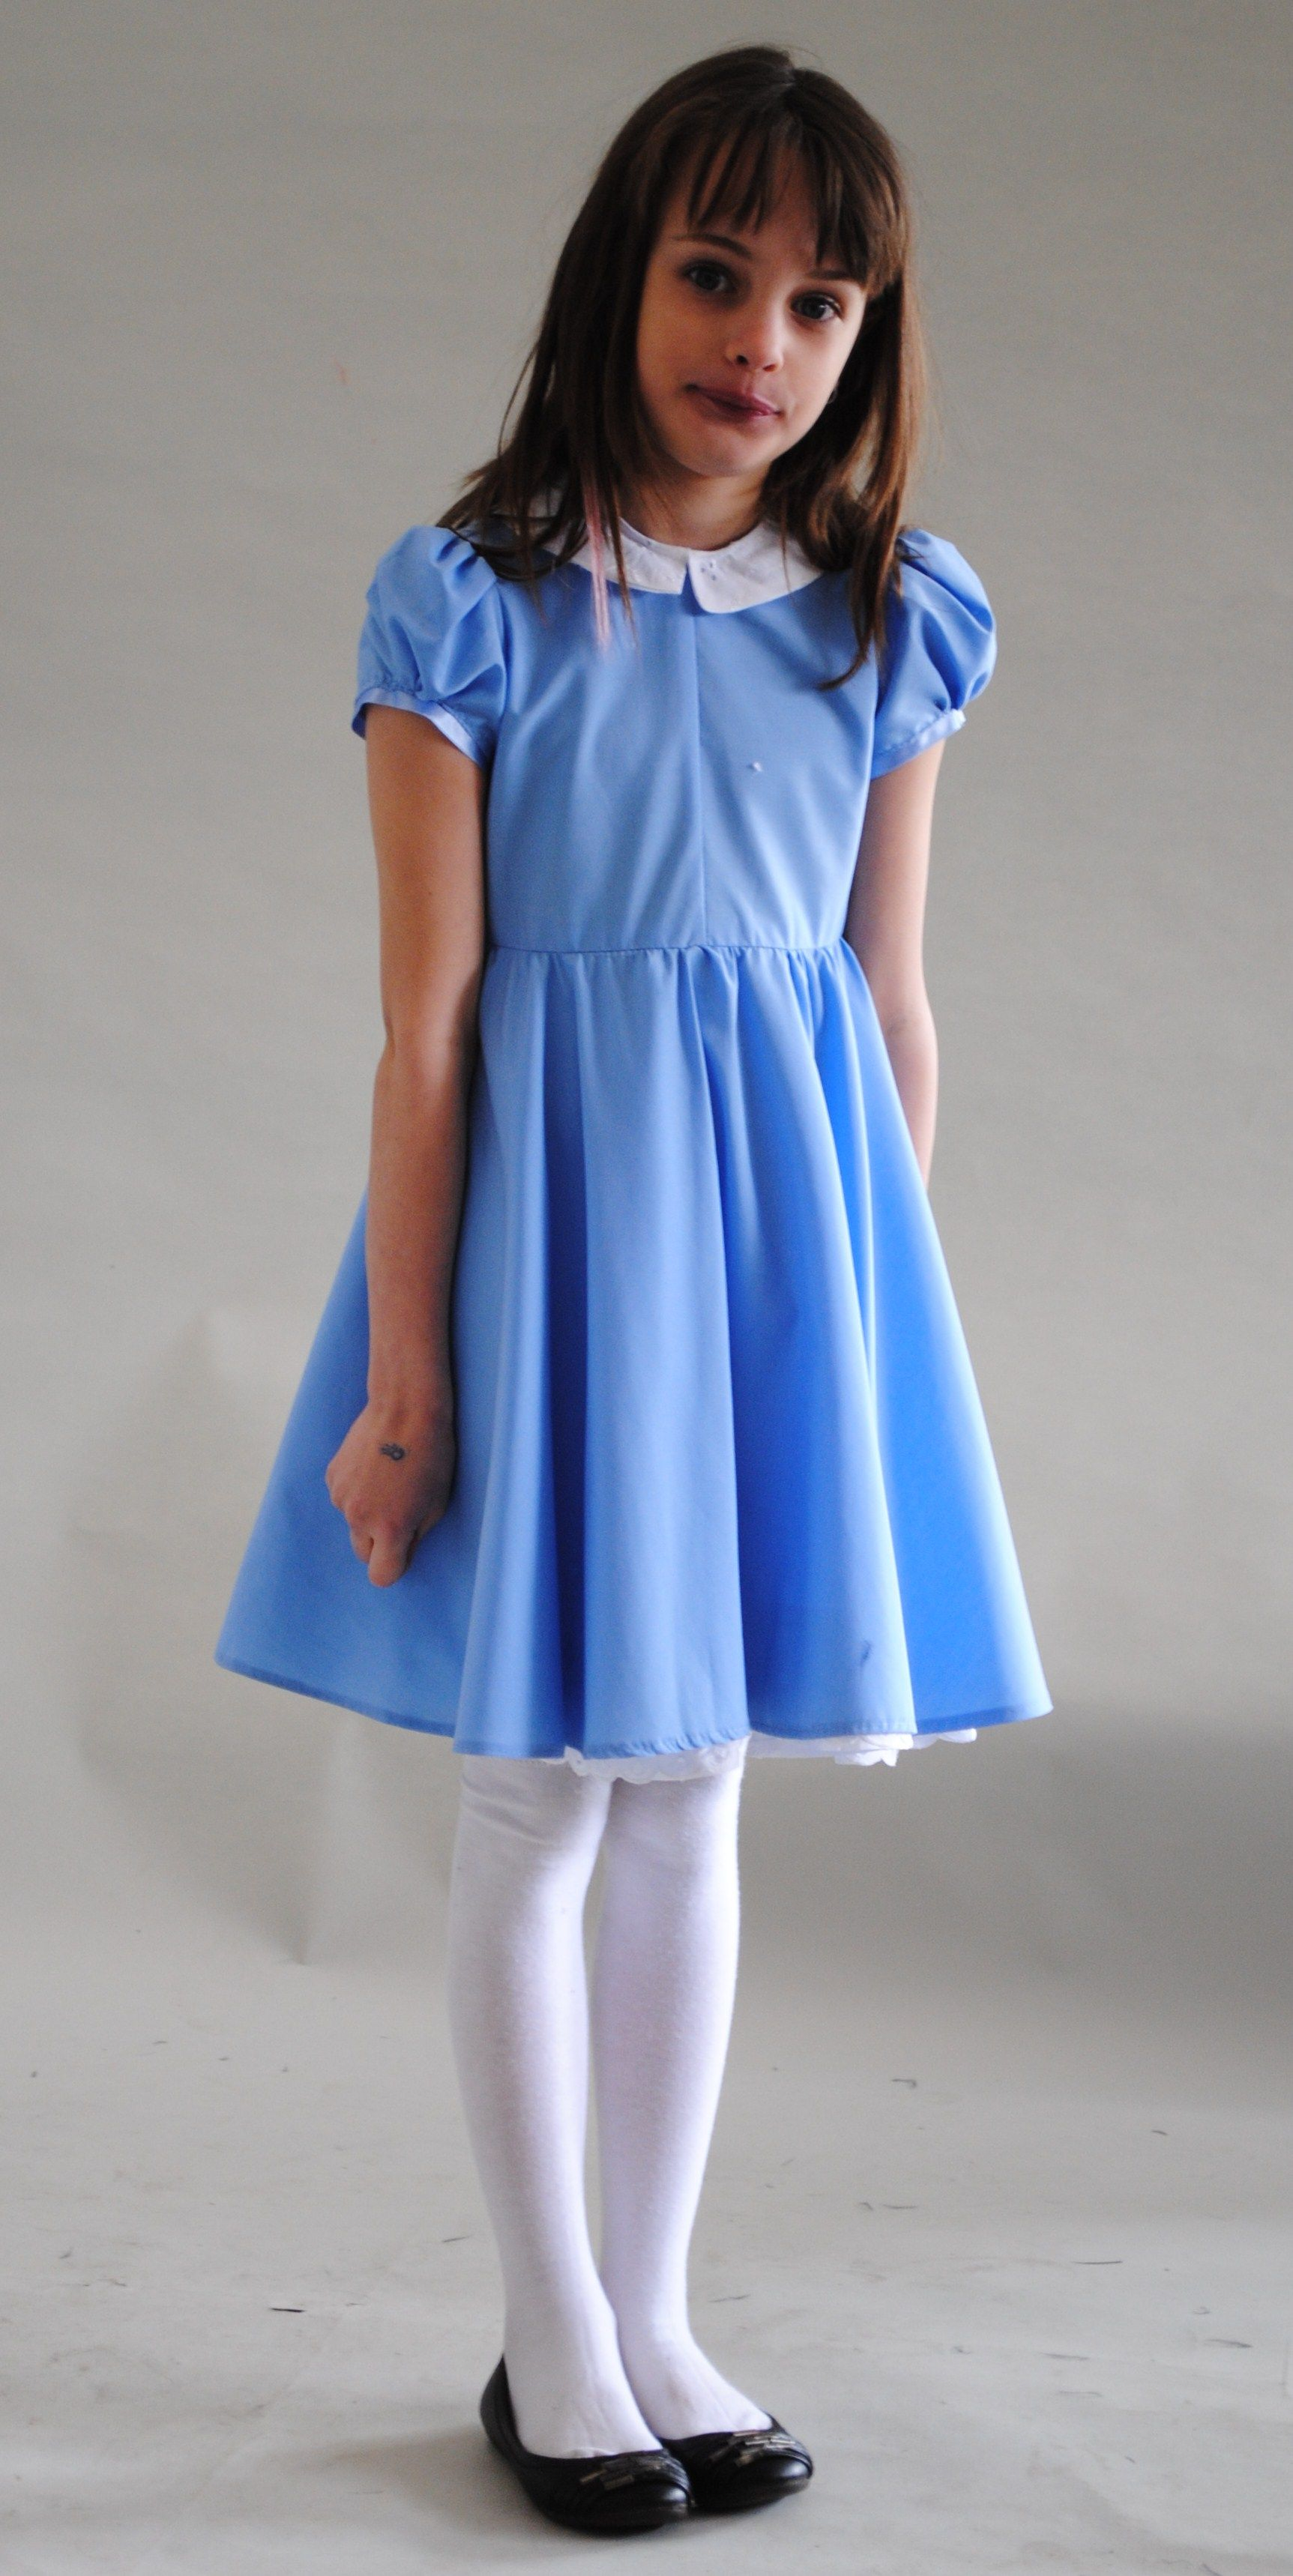 Girls Matilda Costume Roald Dahl Book Day Character Costume Fancy Dress Outfit